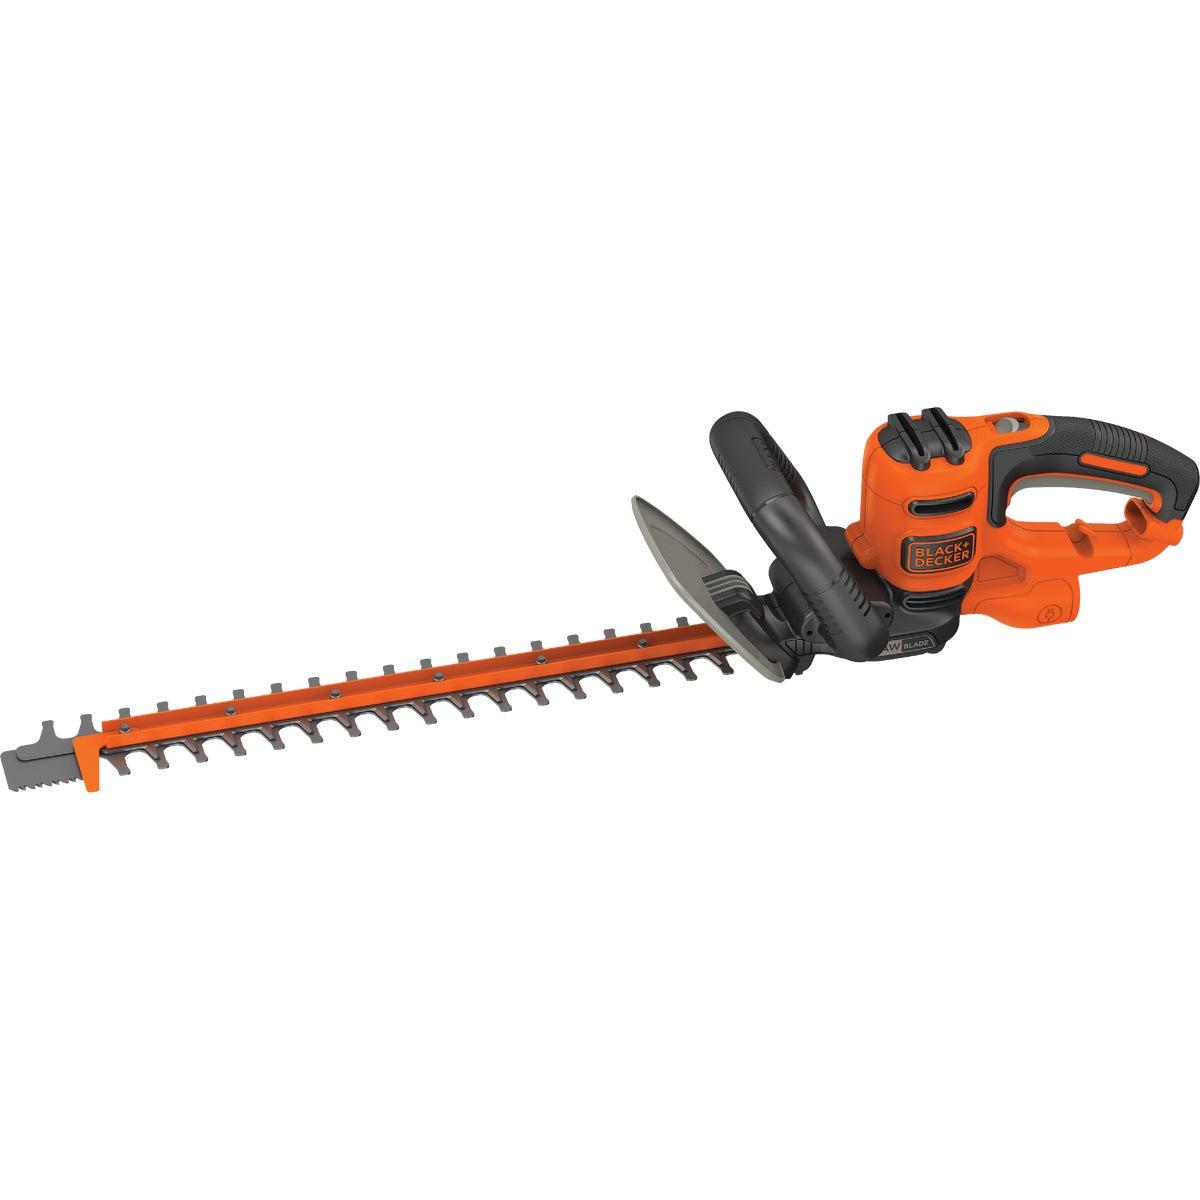 Black & Decker Sawblade 20 In. Corded Electric Hedge Trimmer, BEHTS300